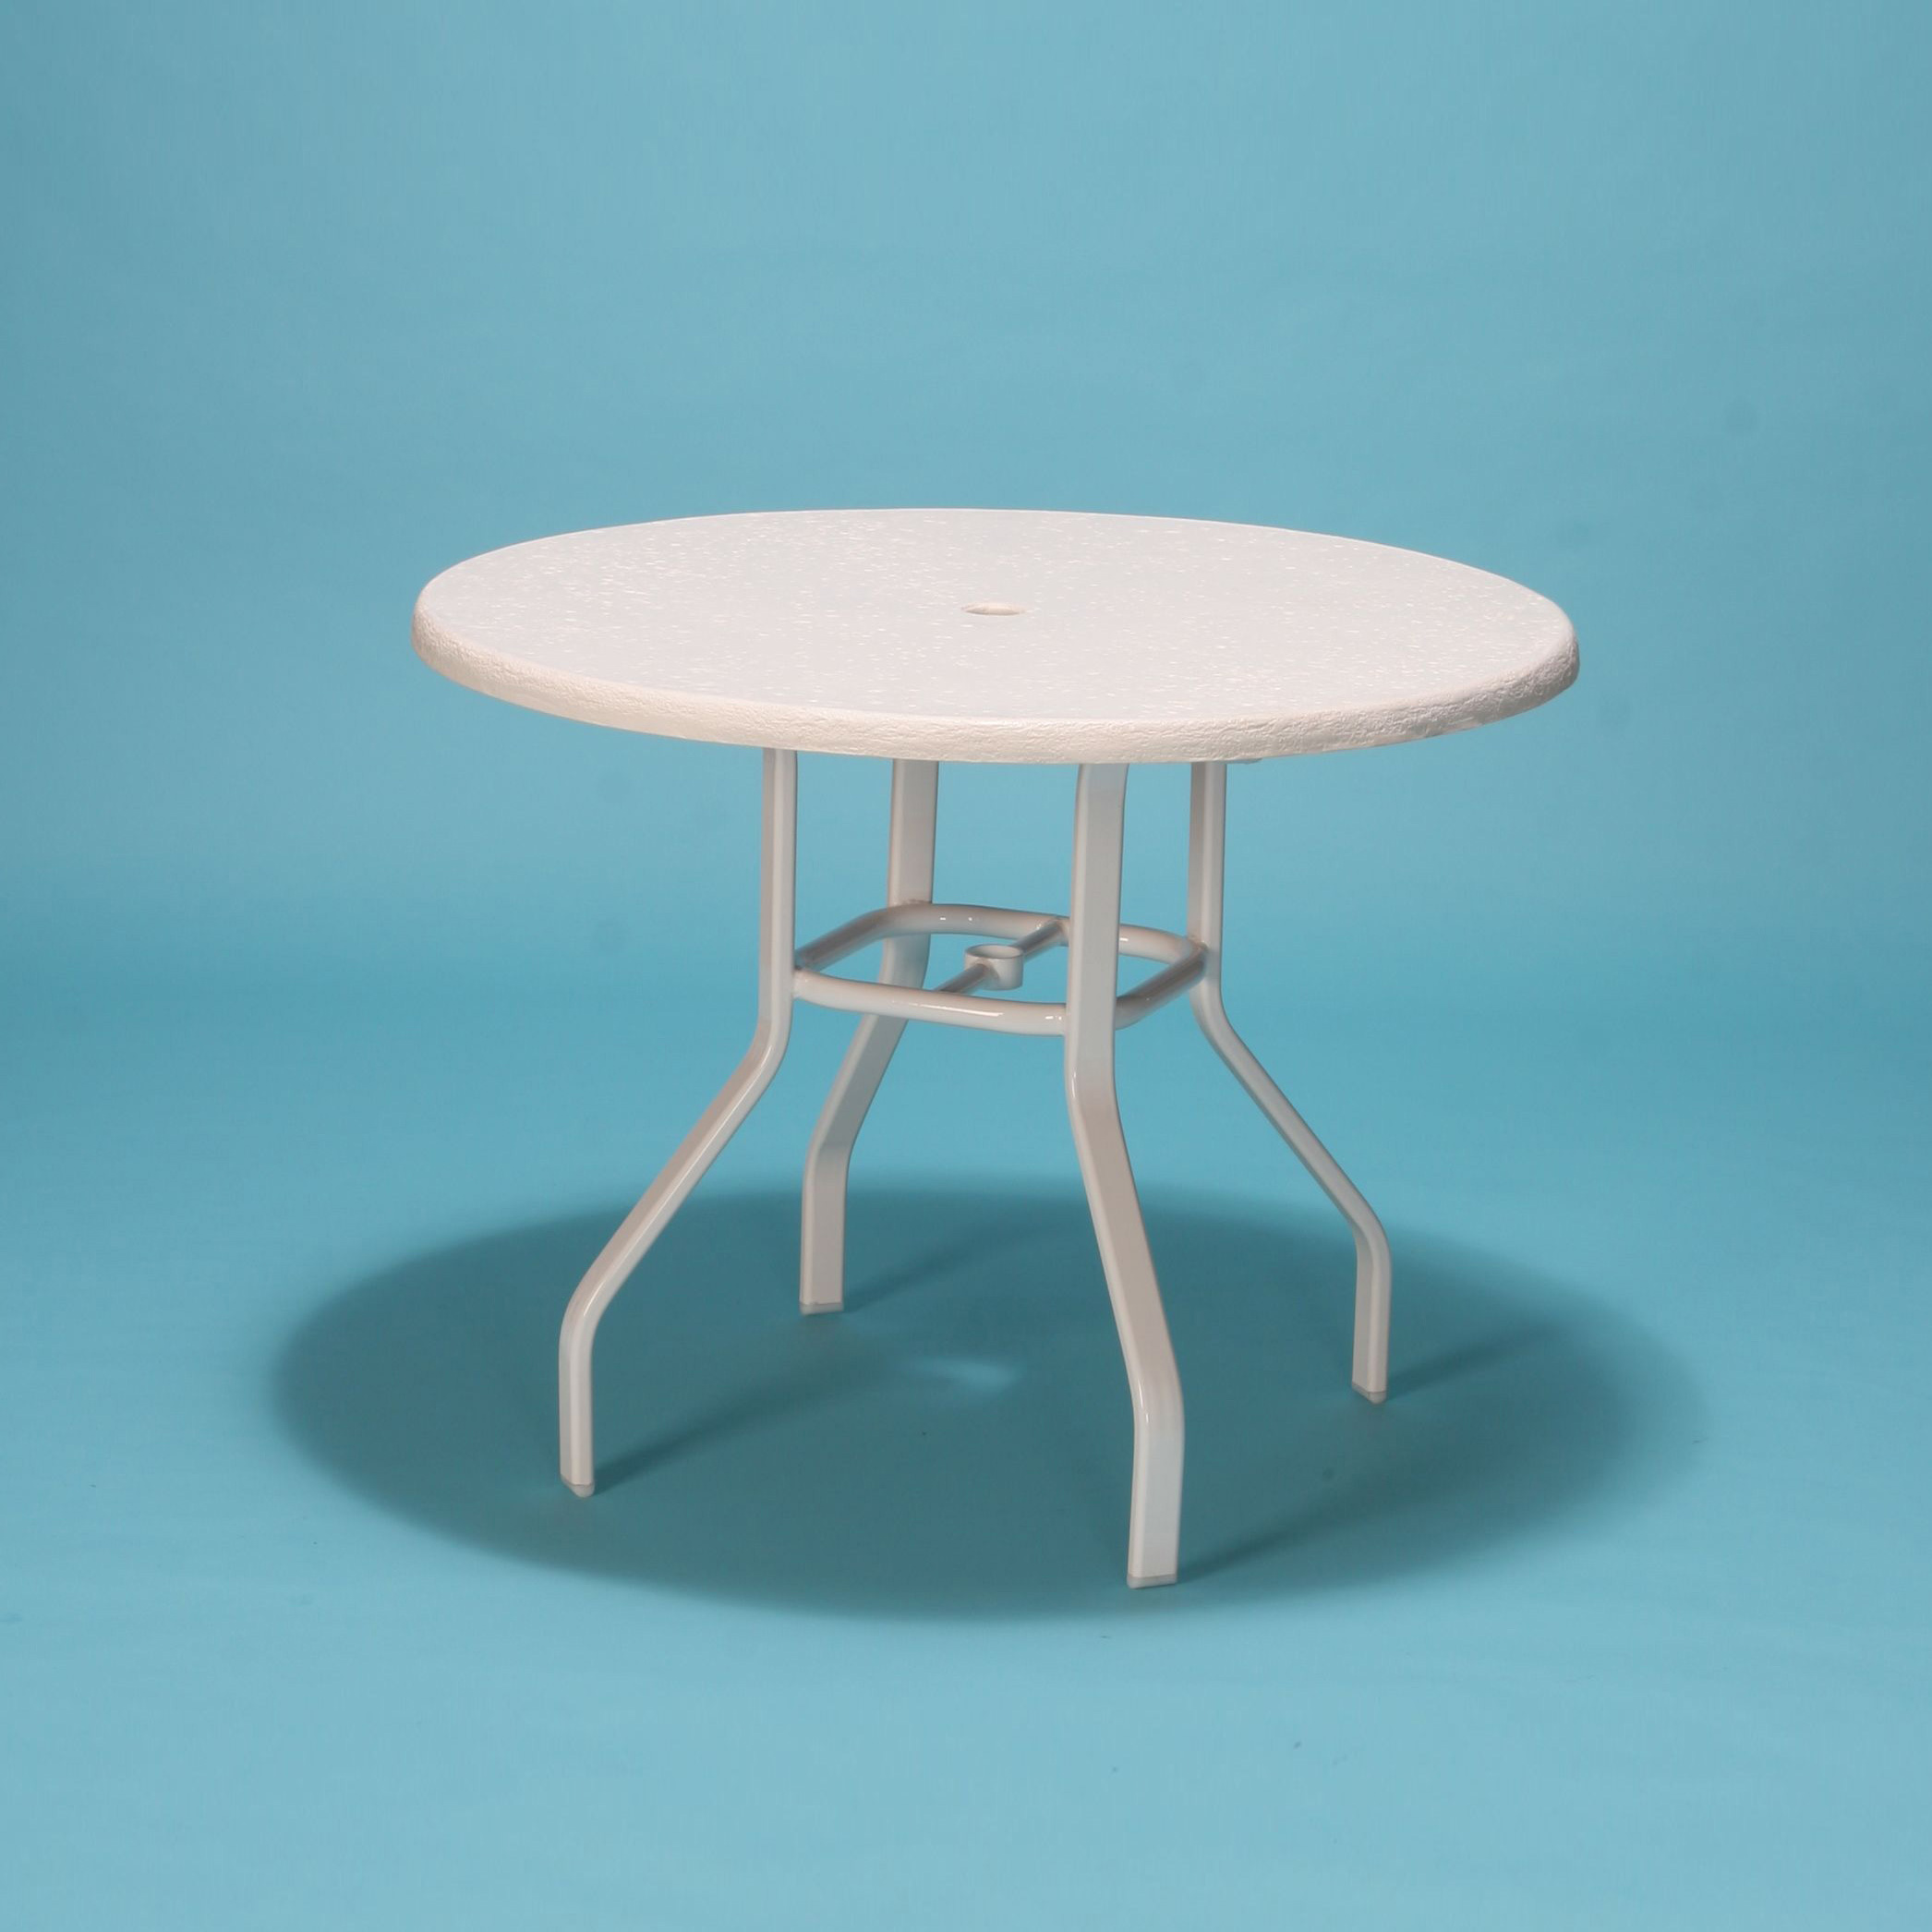 36 Quot Commercial Grade Round Fiberglass Top Table Patio